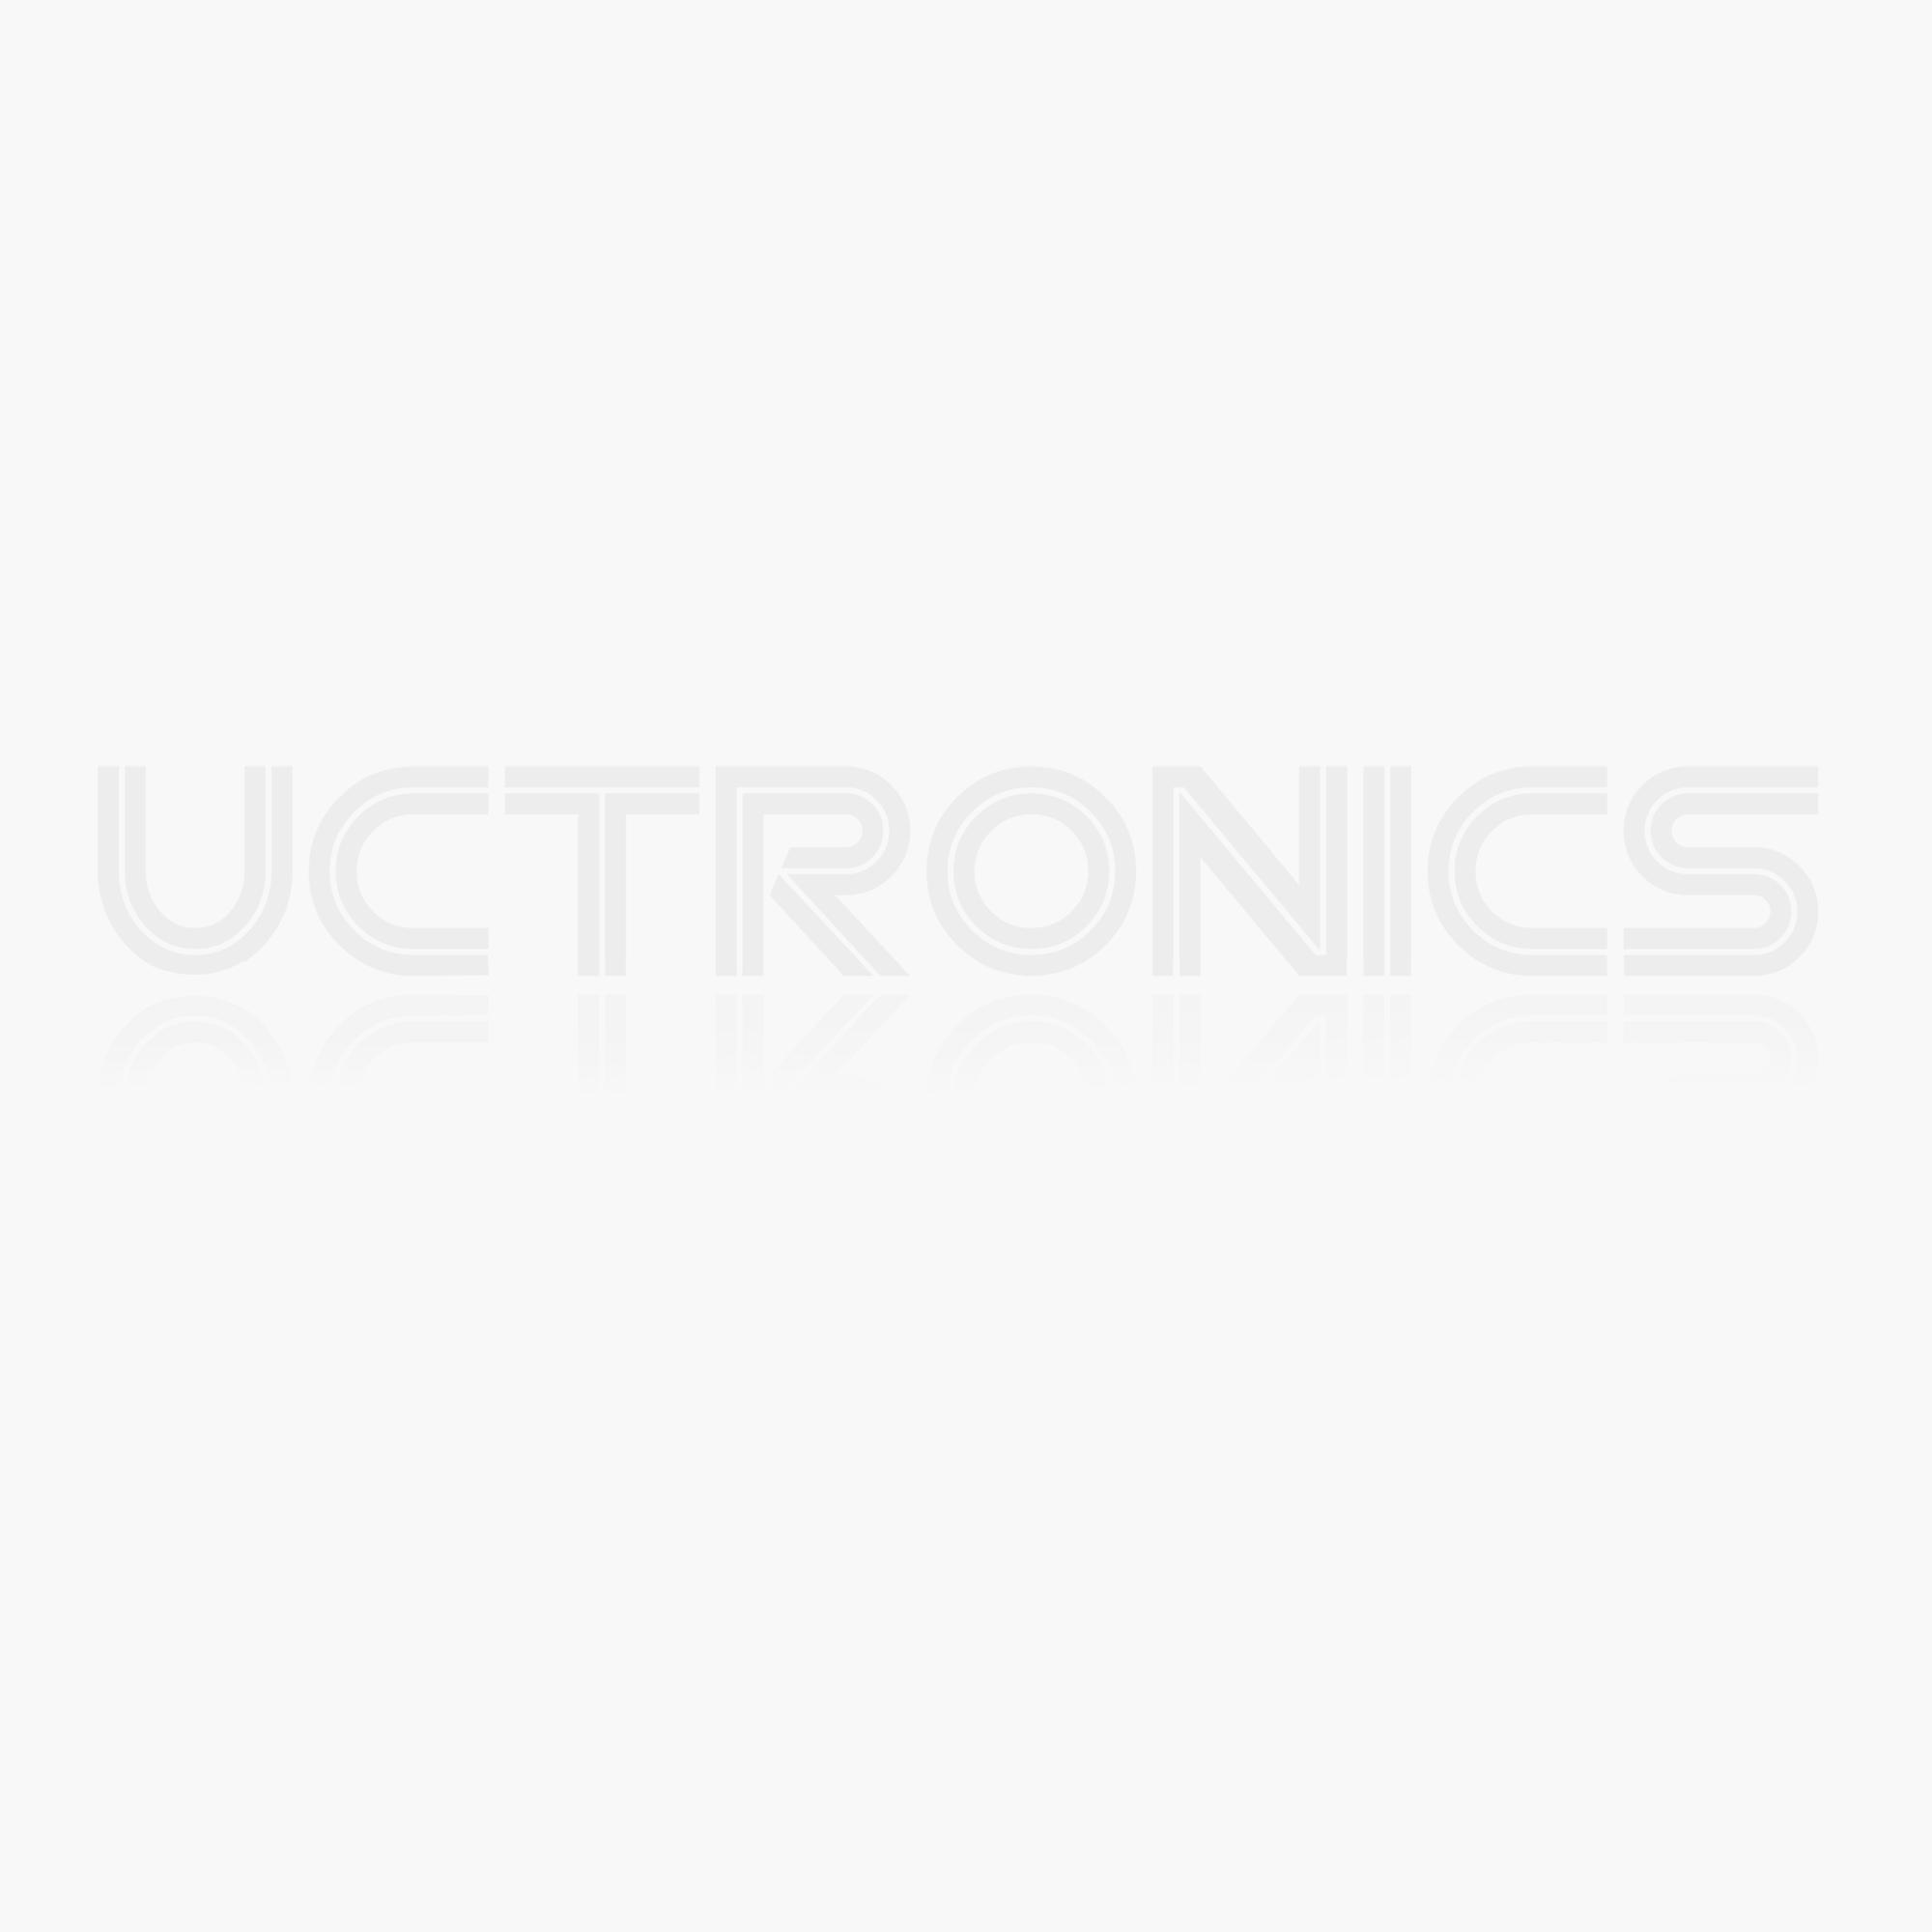 HC-05 Bluetooth Wireless Serial RF Transceiver Communication Module for Arduino